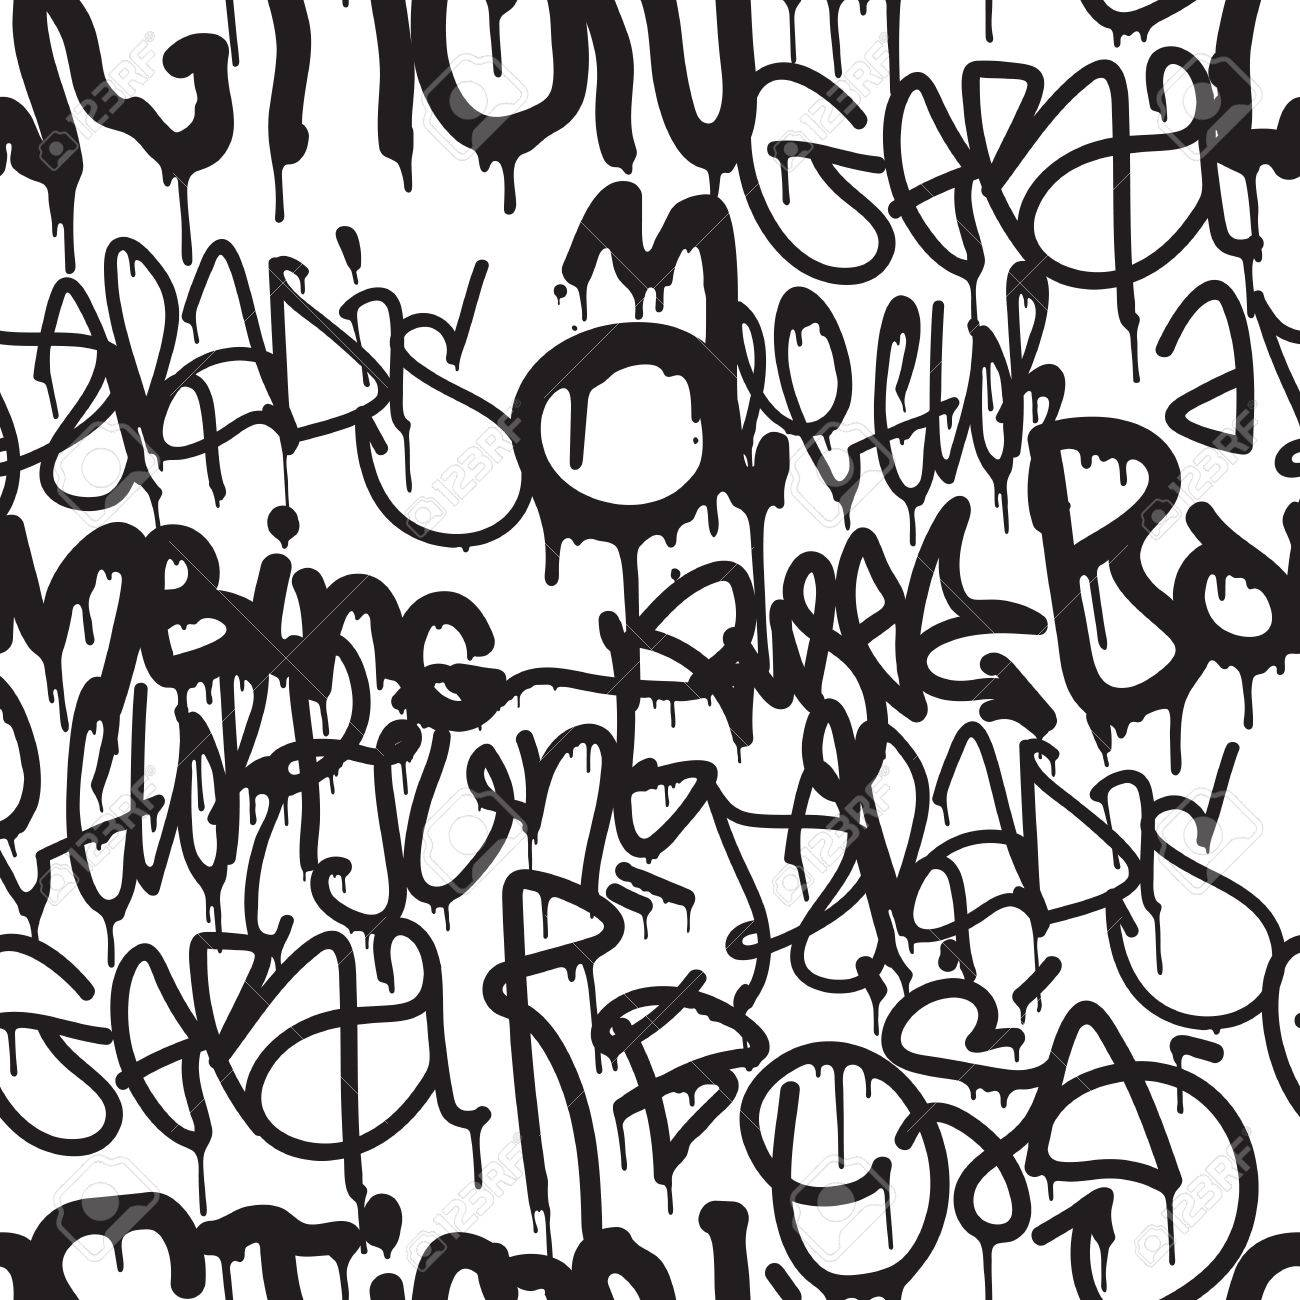 Graffiti background seamless pattern vector tags writing graffiti tagging hand style old